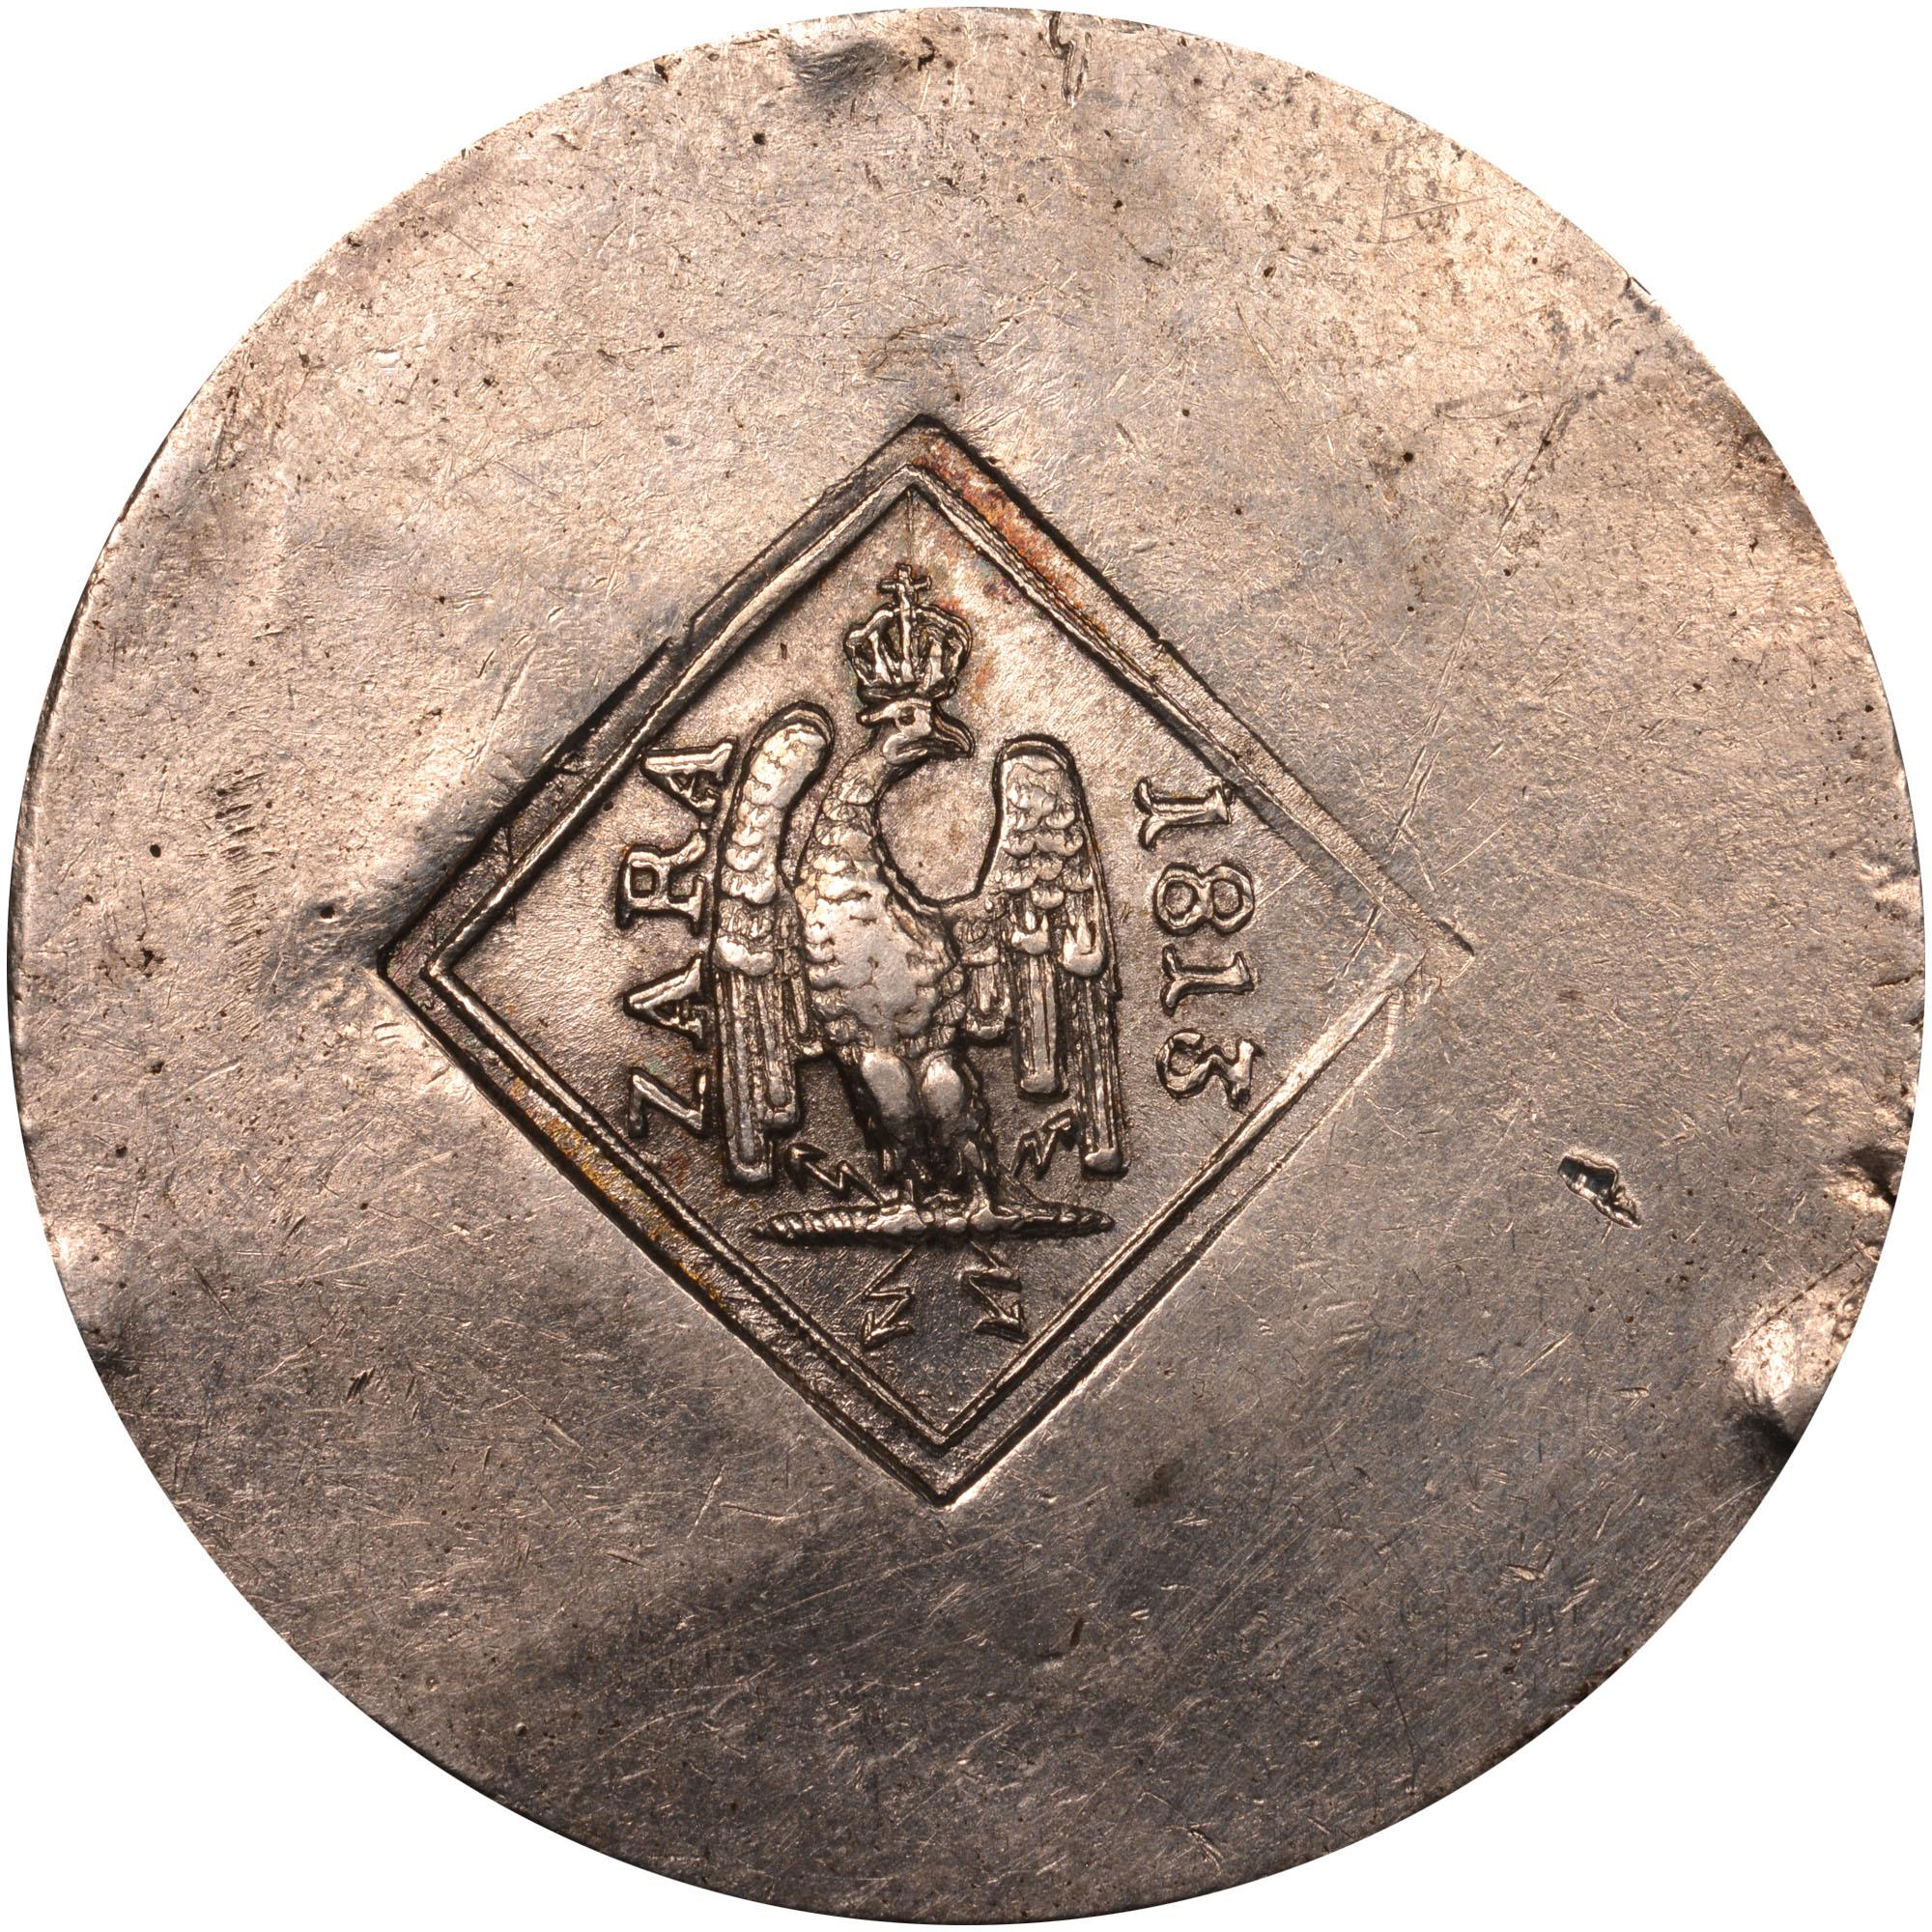 1813 Croatia ZARA 4 Francs-60 Centimes obverse